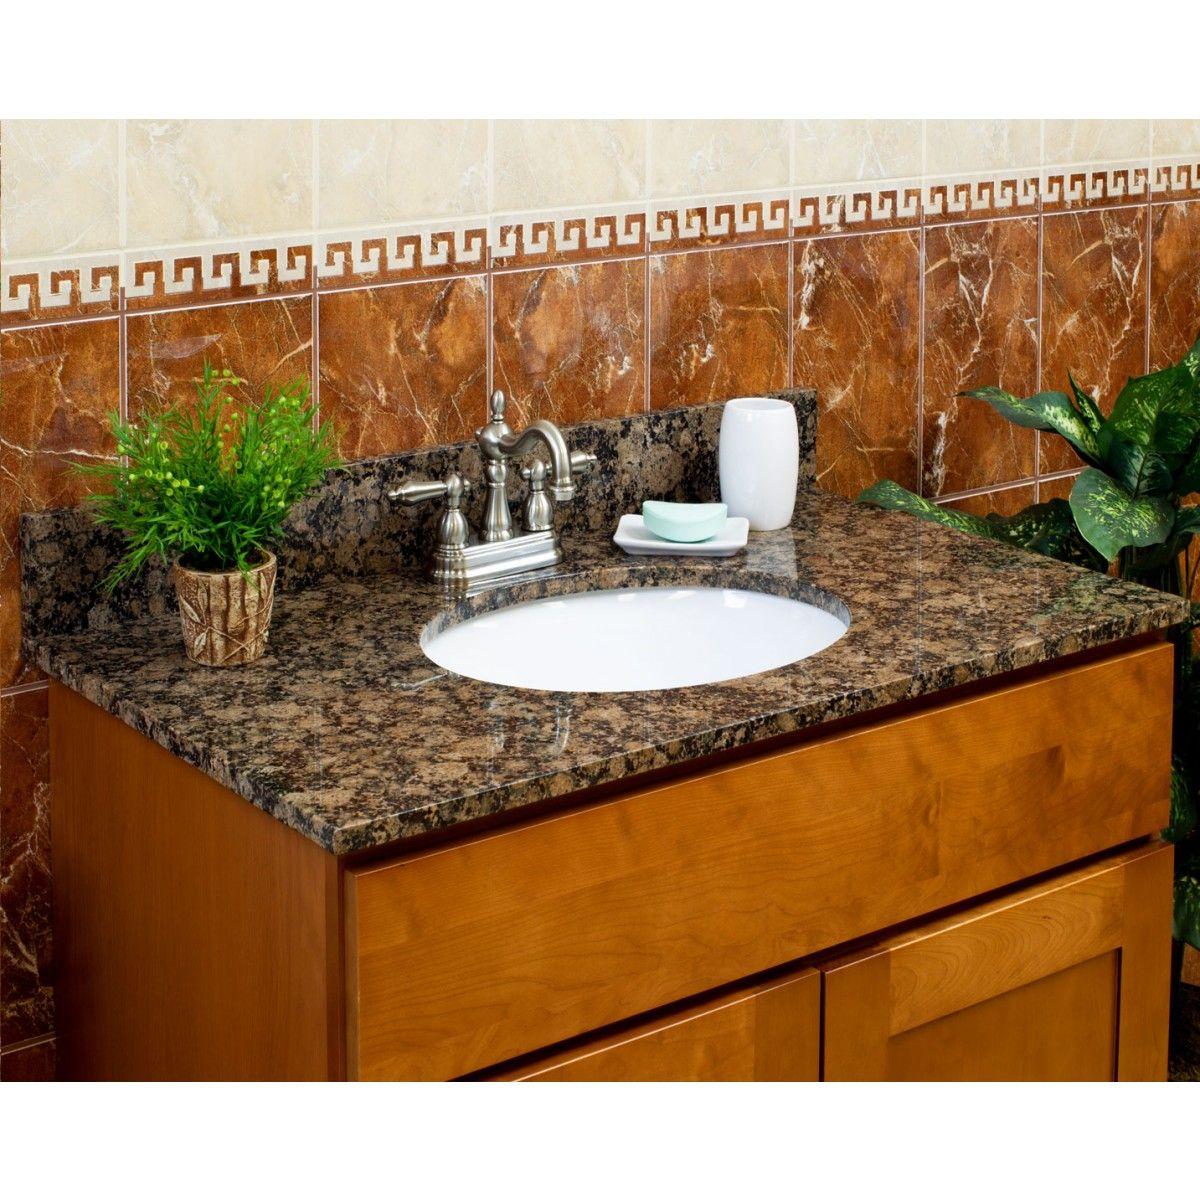 bathroom vanity granite backsplash. baltic brown granite vanity tops - bathroom backsplash